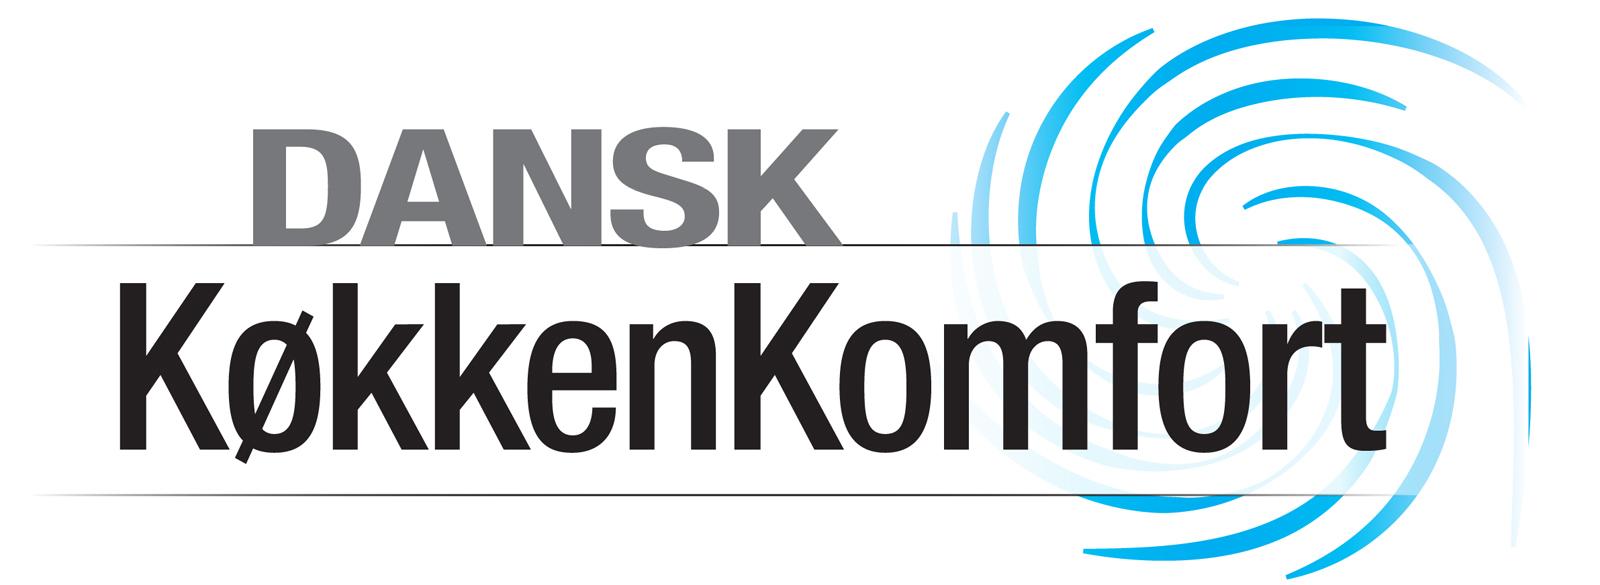 Contact Dansk Køkkenkomfort